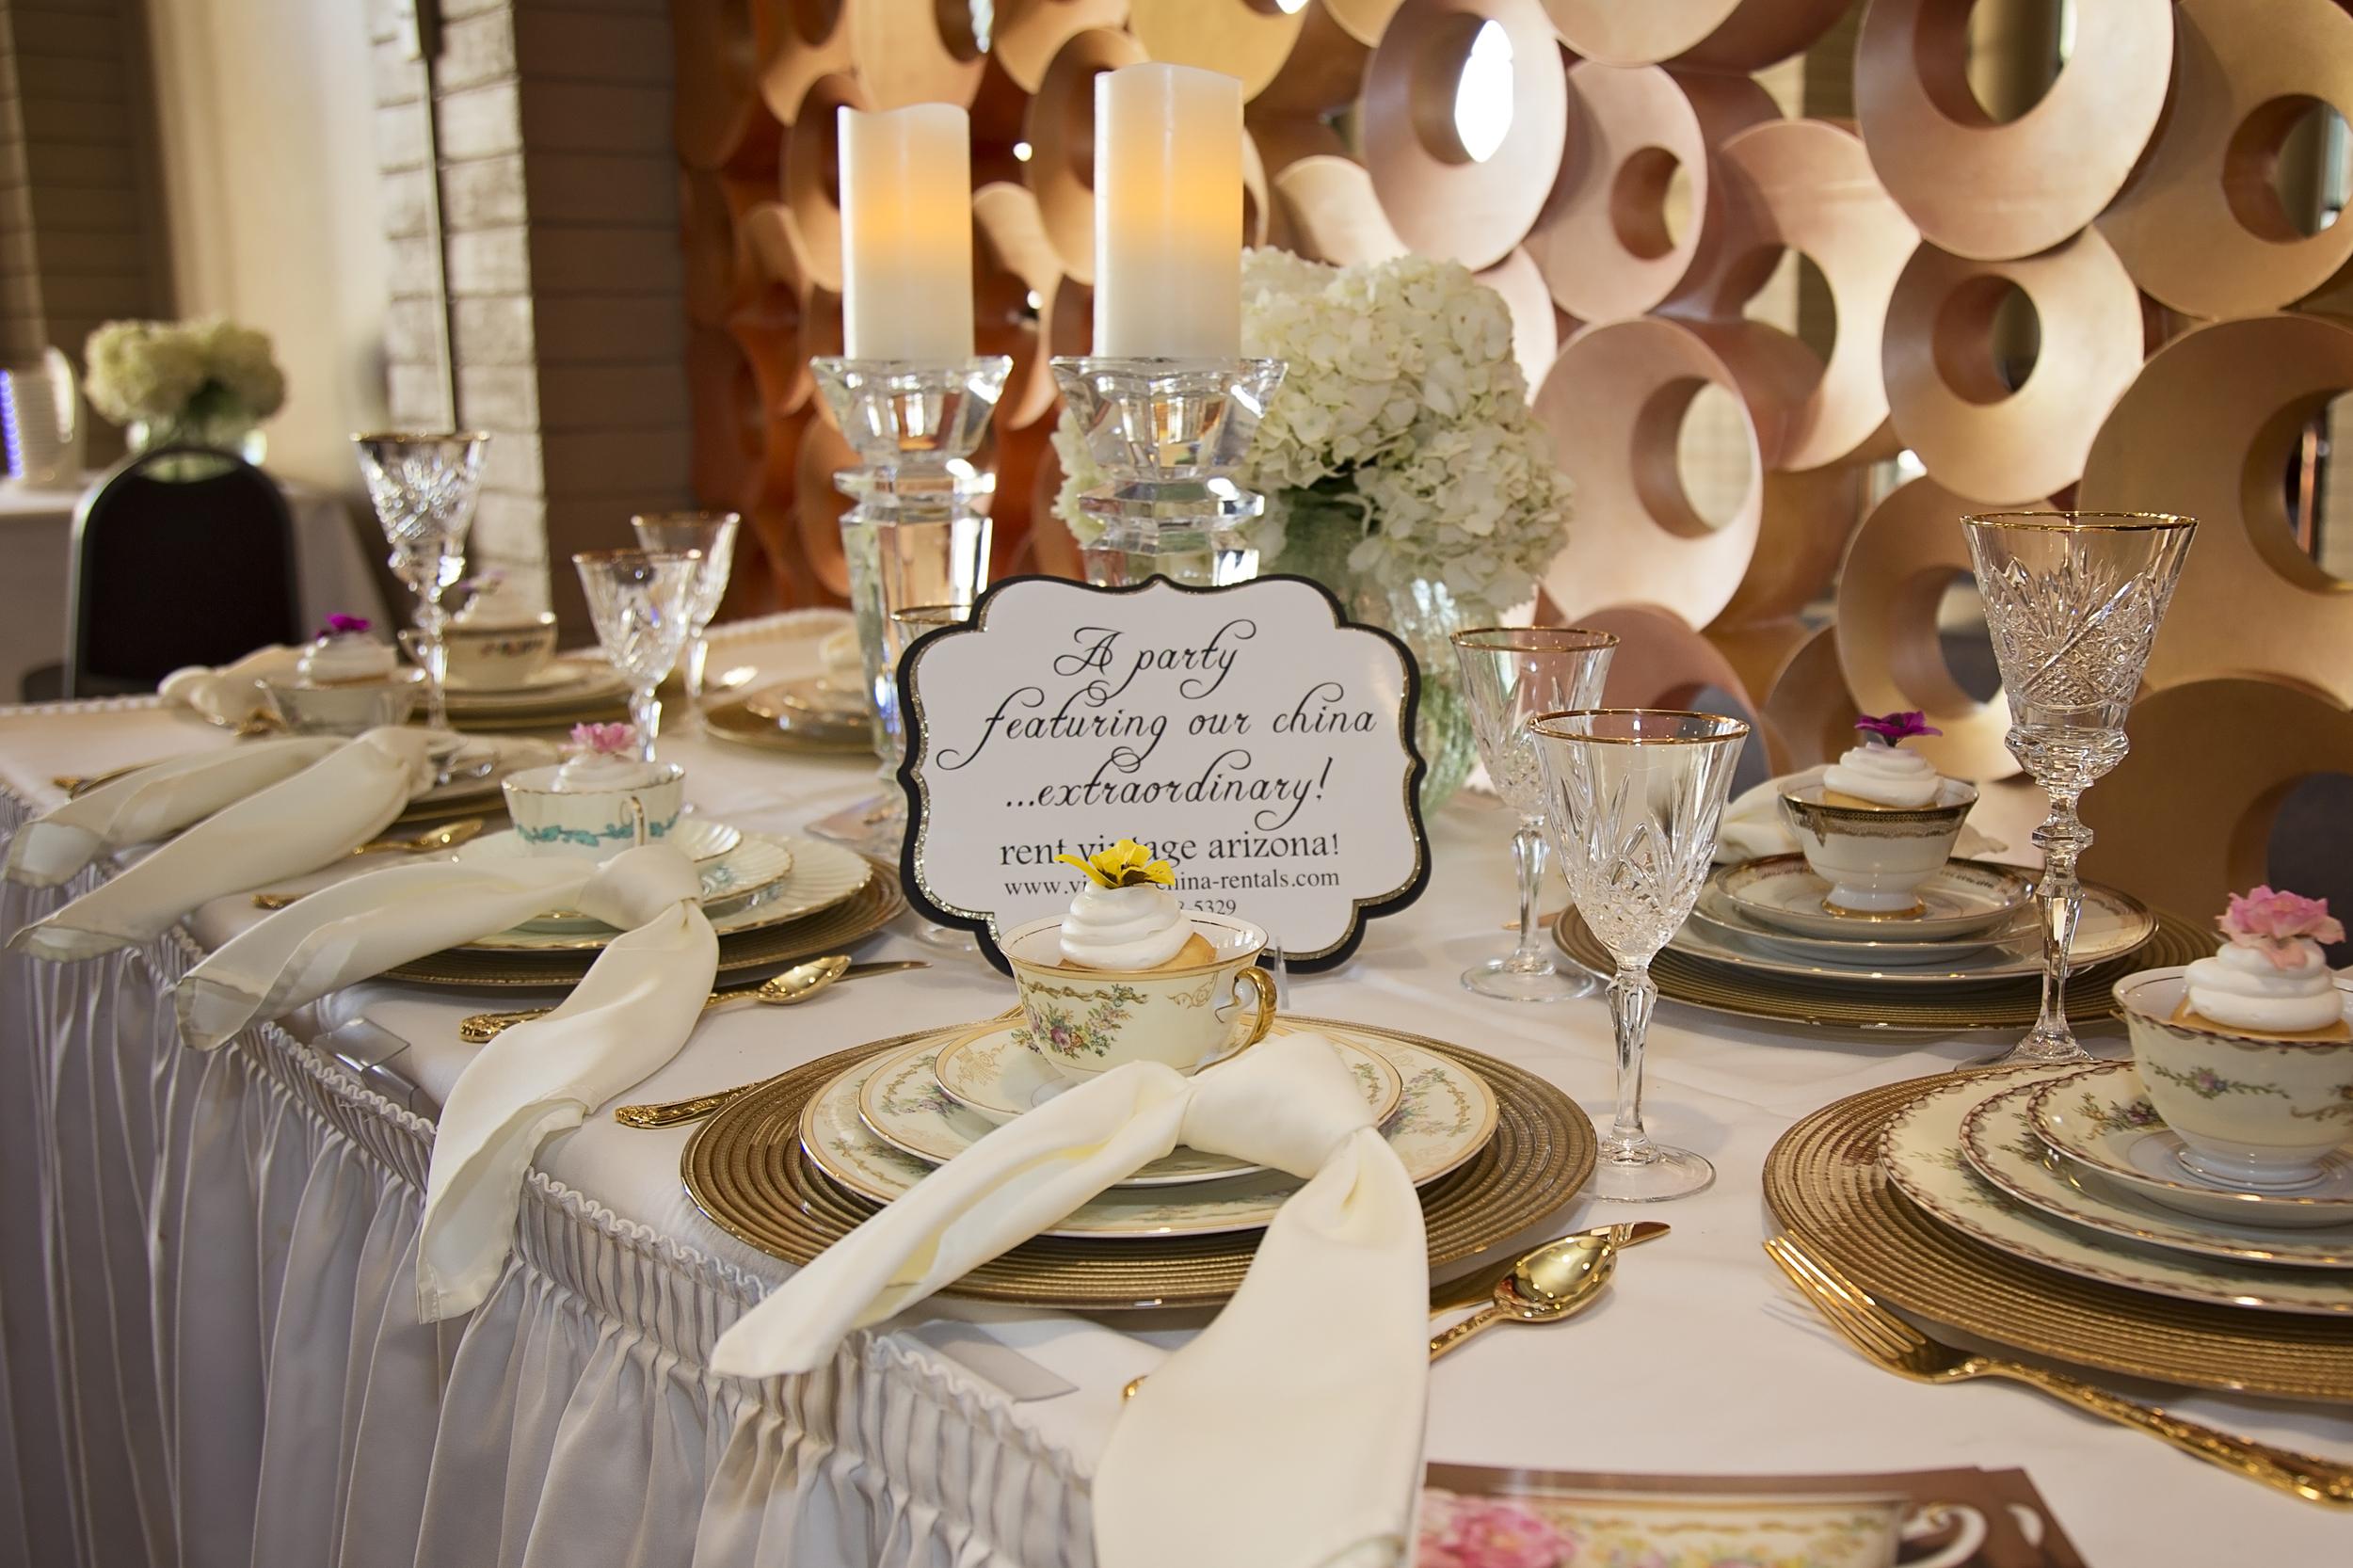 Enchanted Wedding Tours - Tea 1.30.16-23.jpg